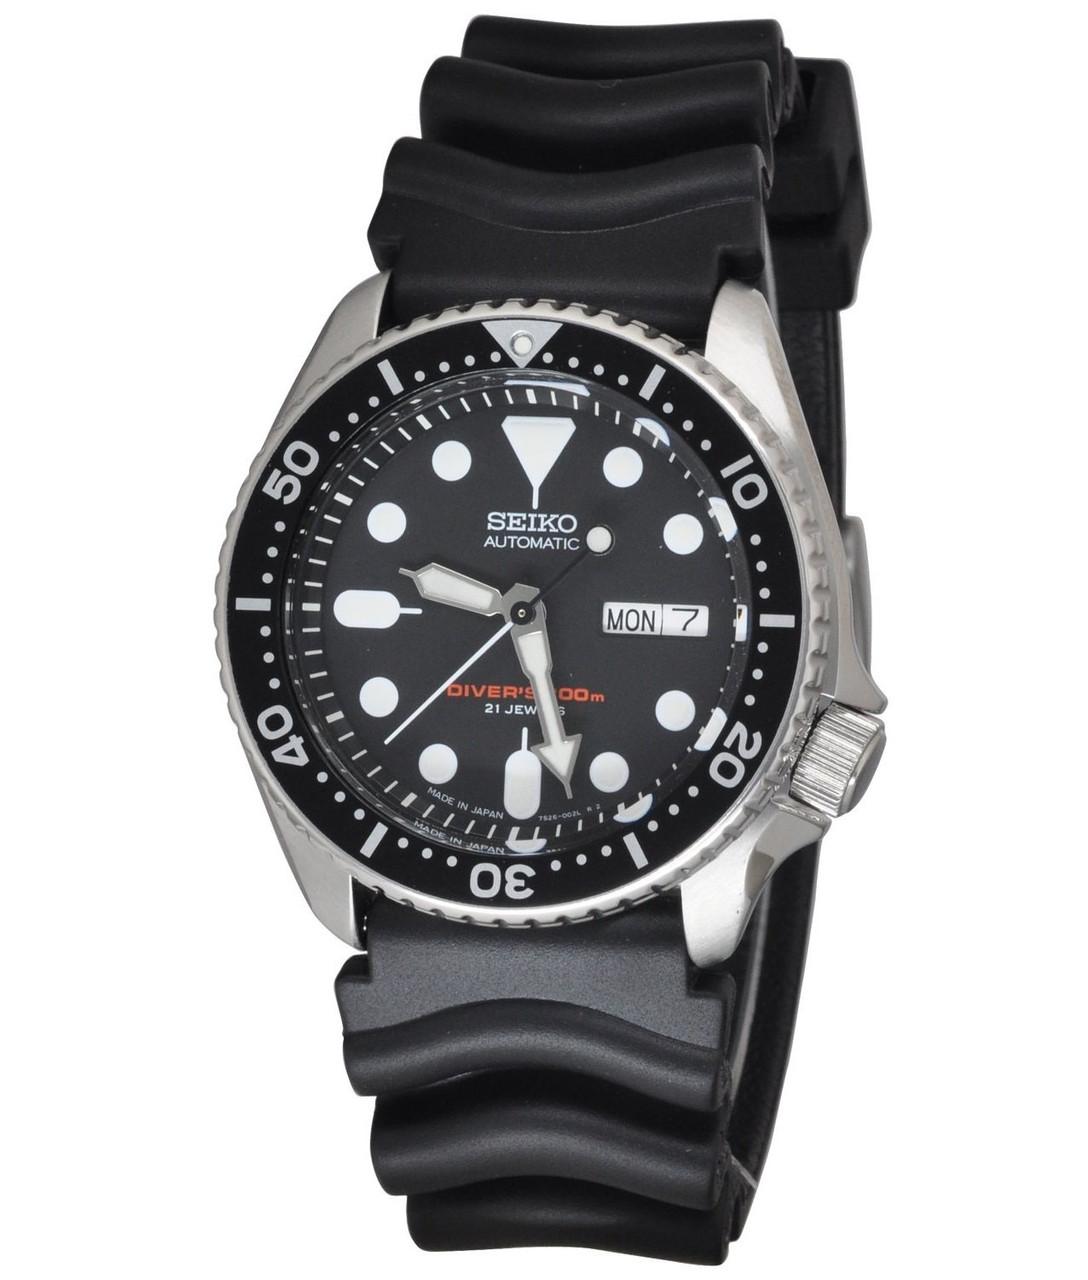 Часы Seiko SKX007J1 Automatic Diver's